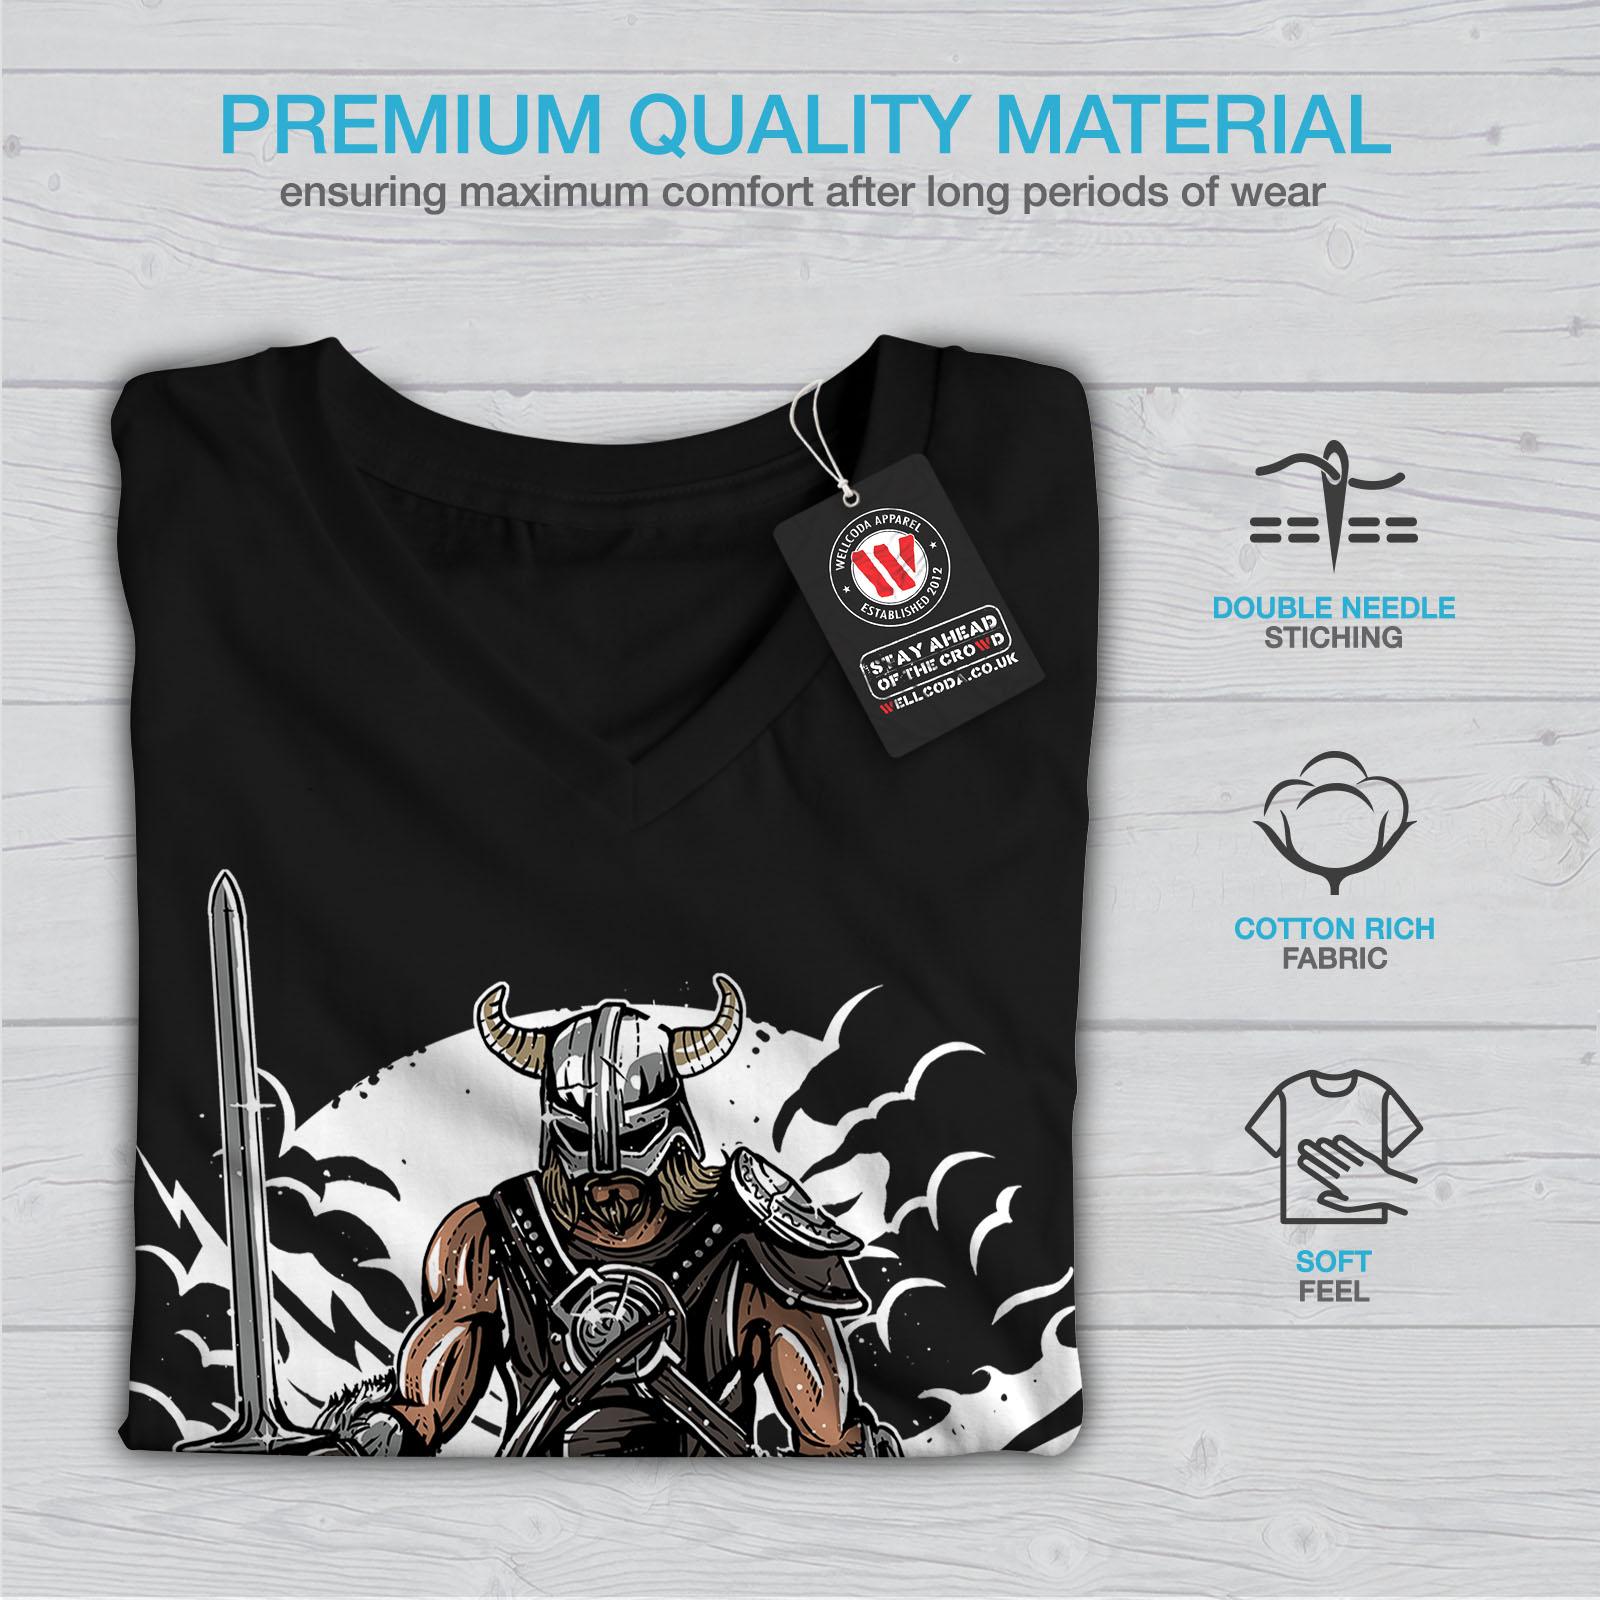 Viking-Warrior-Fashion-Women-V-Neck-T-shirt-NEW-Wellcoda miniatuur 5